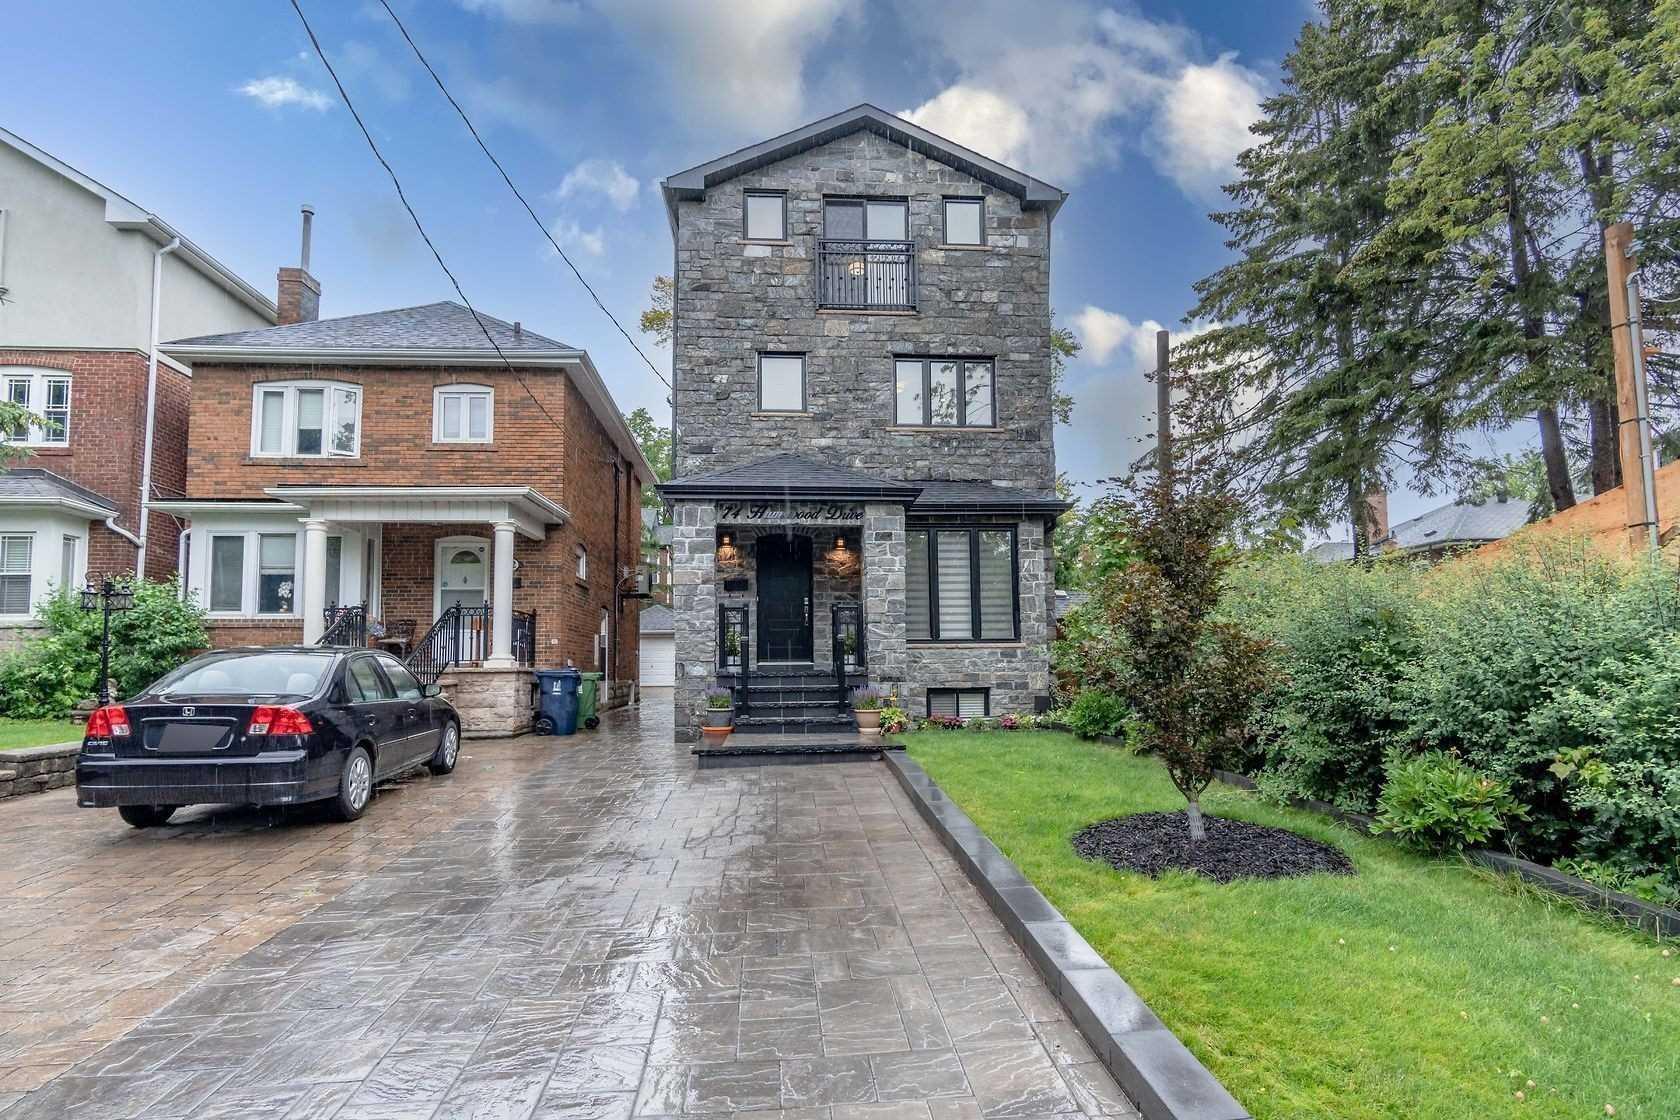 74 Humewood Dr, Toronto, Ontario M6C2W5, 4 Bedrooms Bedrooms, 9 Rooms Rooms,5 BathroomsBathrooms,Detached,For Sale,Humewood,C5312835